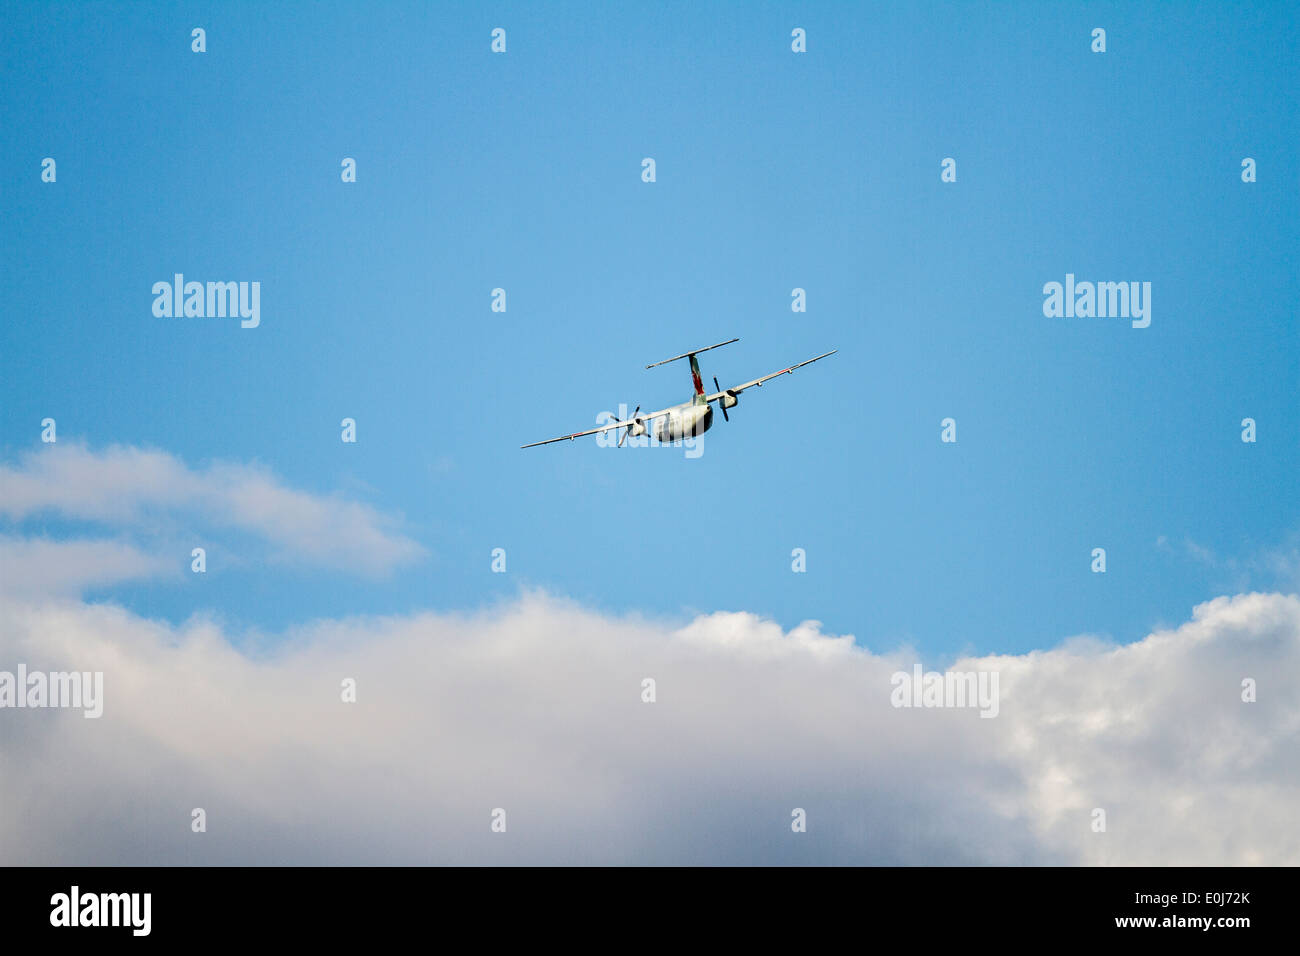 Bombardier Dash 8_001.CR2. In flight in blue sky. Cranbrook, British Columbia, Canada - Stock Image